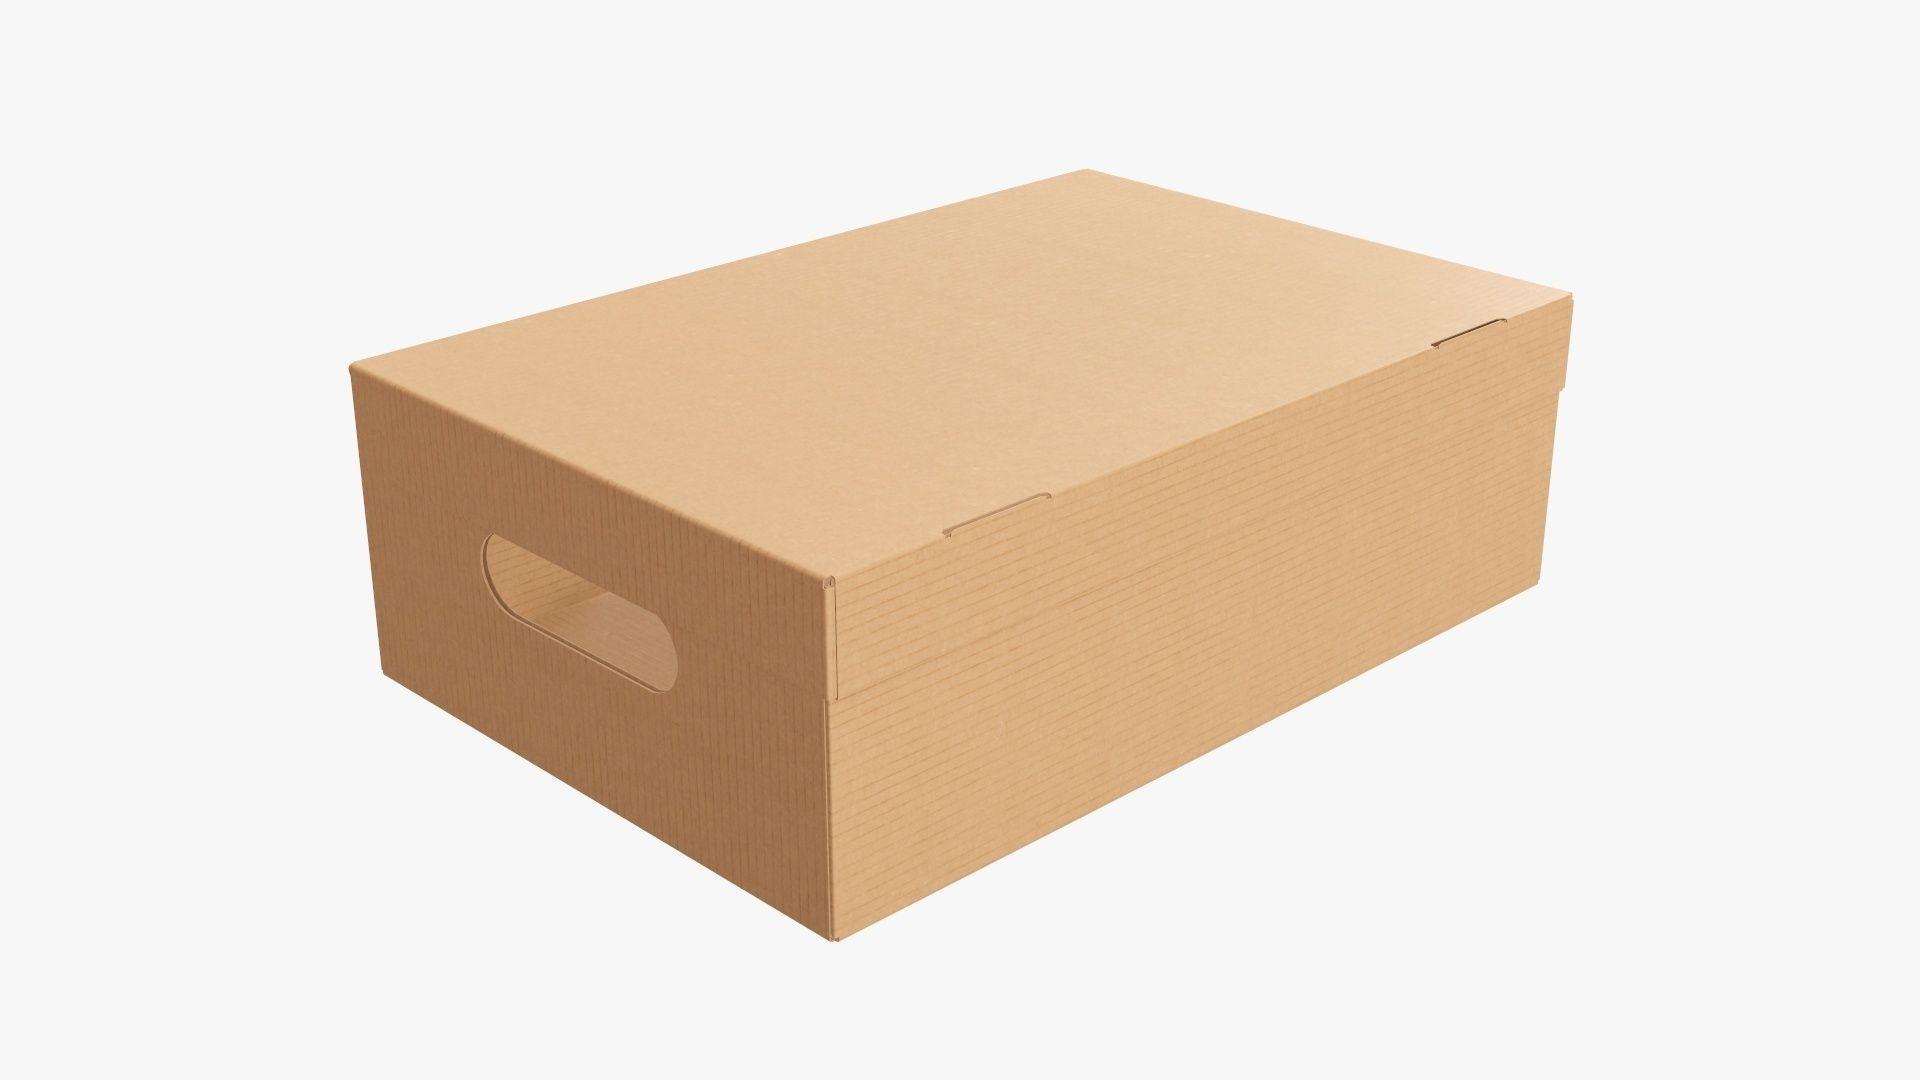 Closed shoes cardboard box